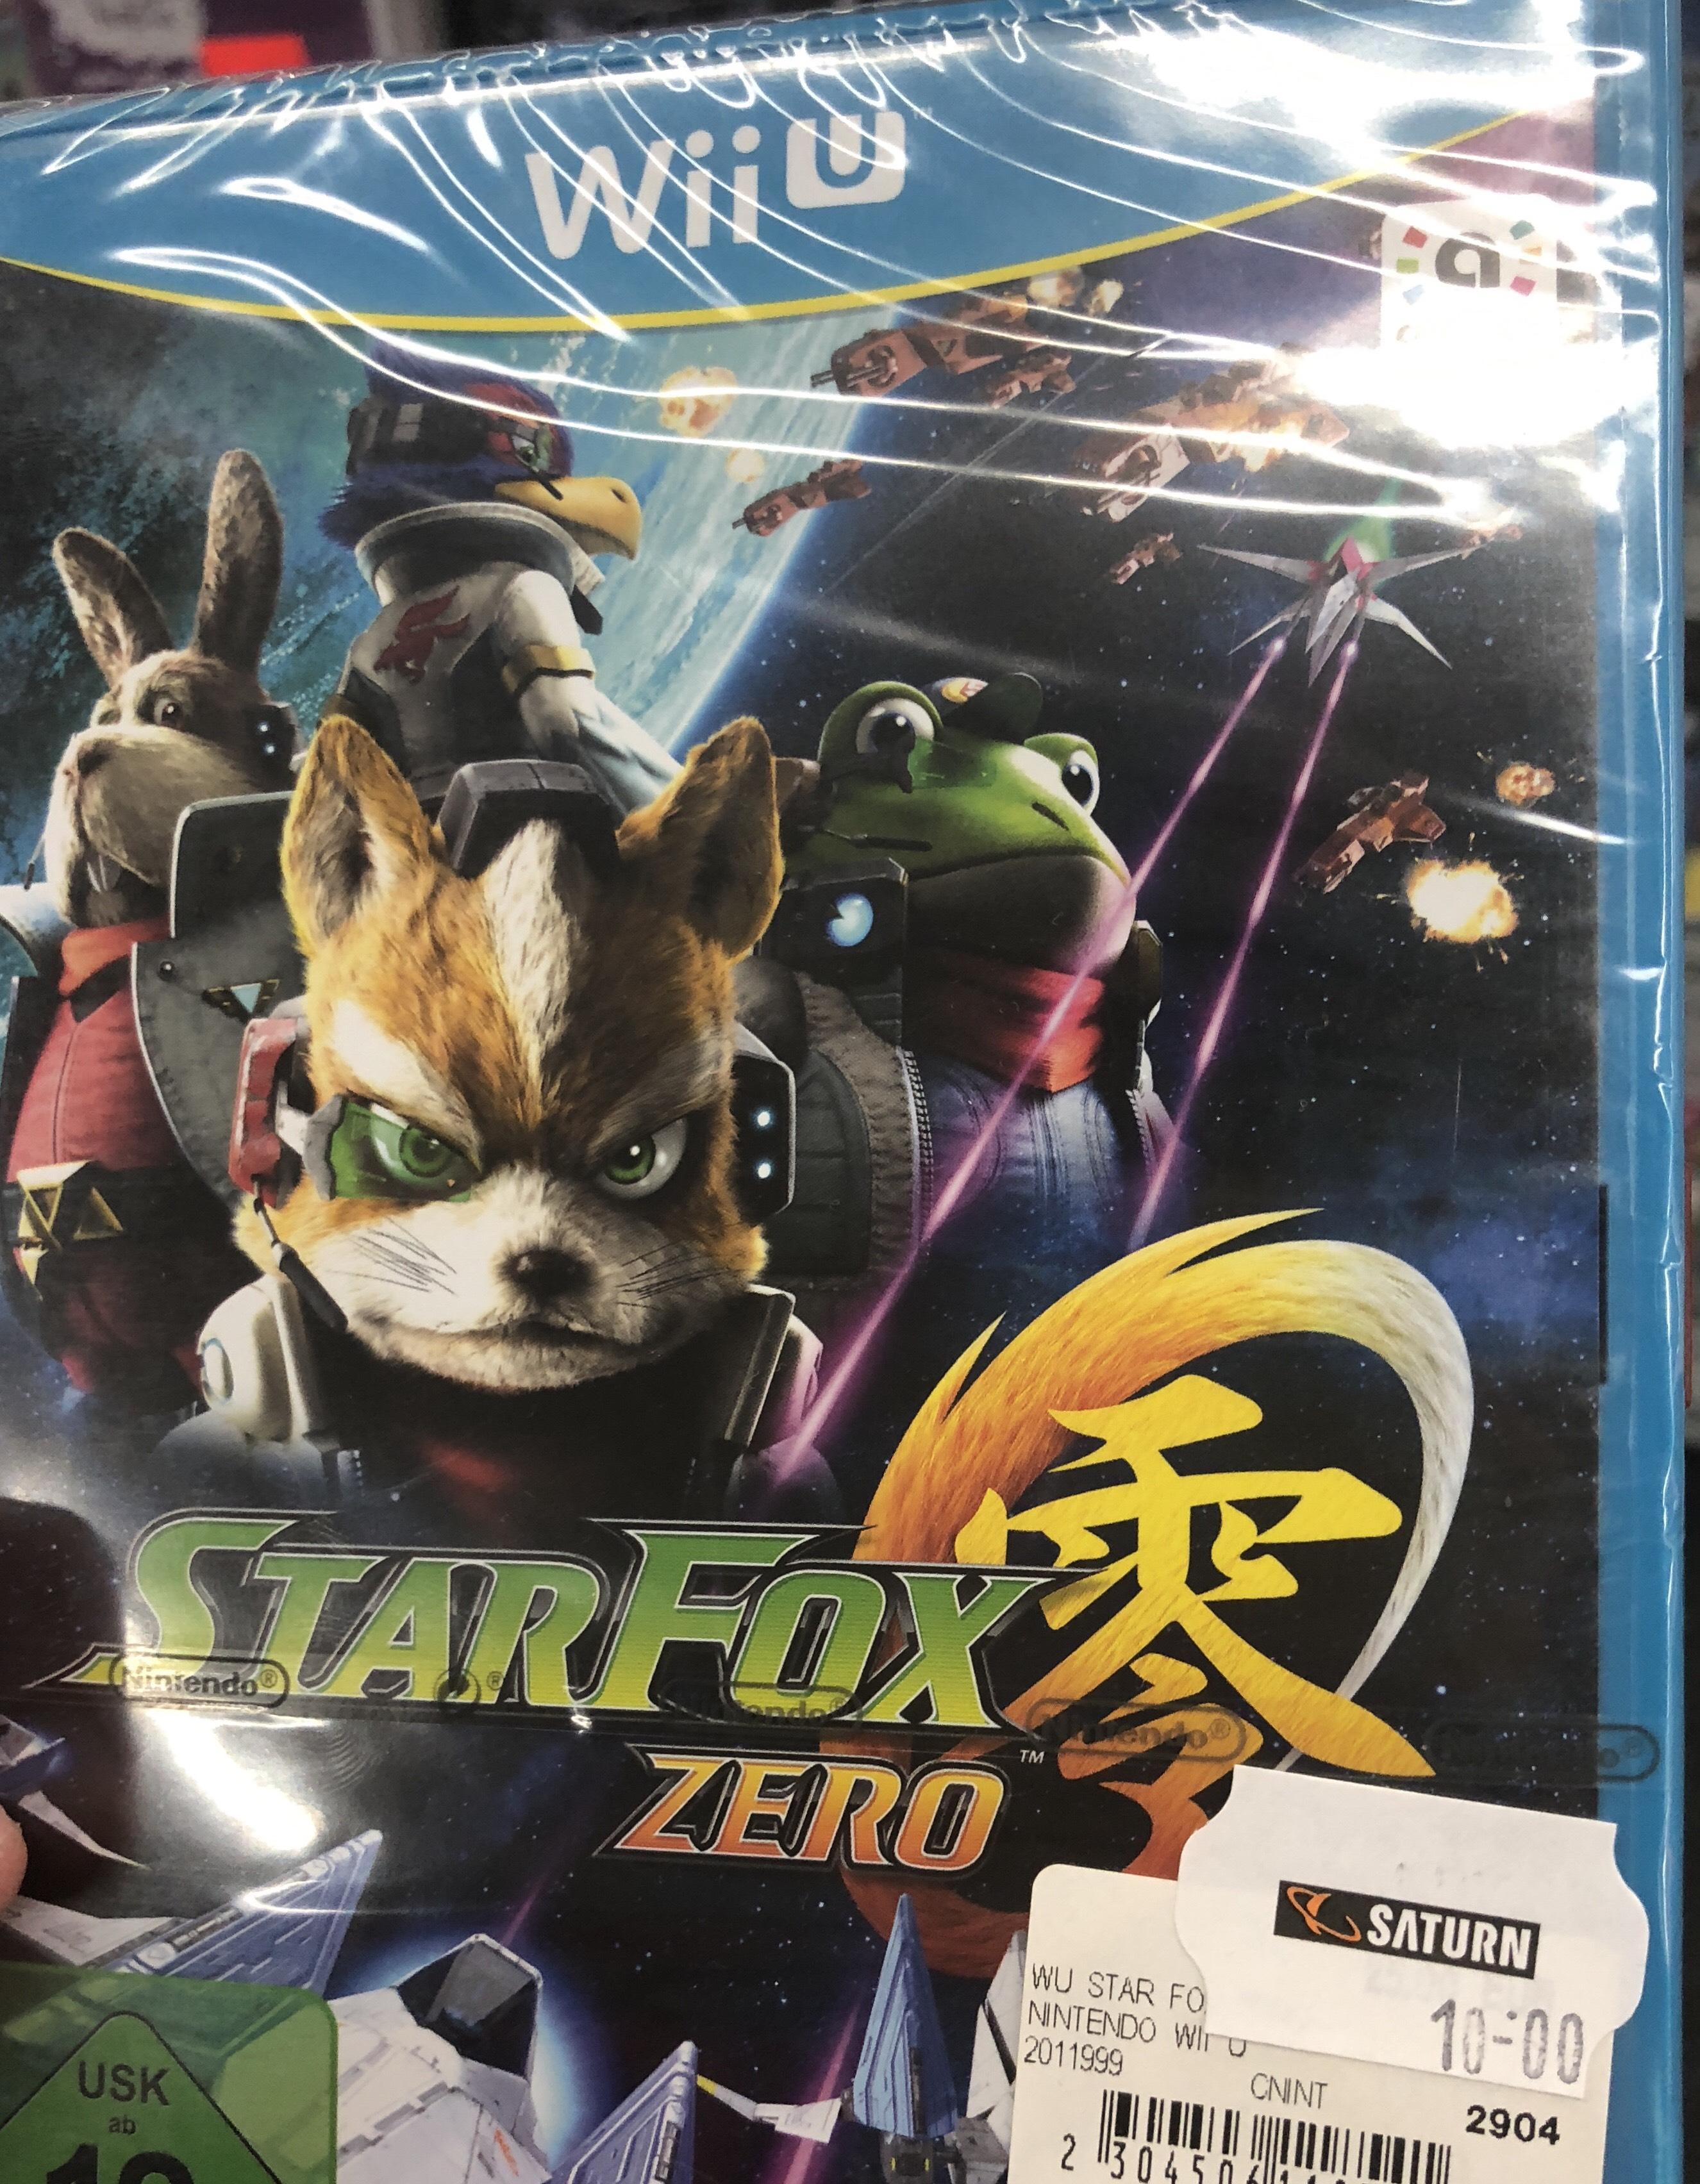 Star Fox Zero - WiiU - / 10 € / Saturn Moers / LOKAL